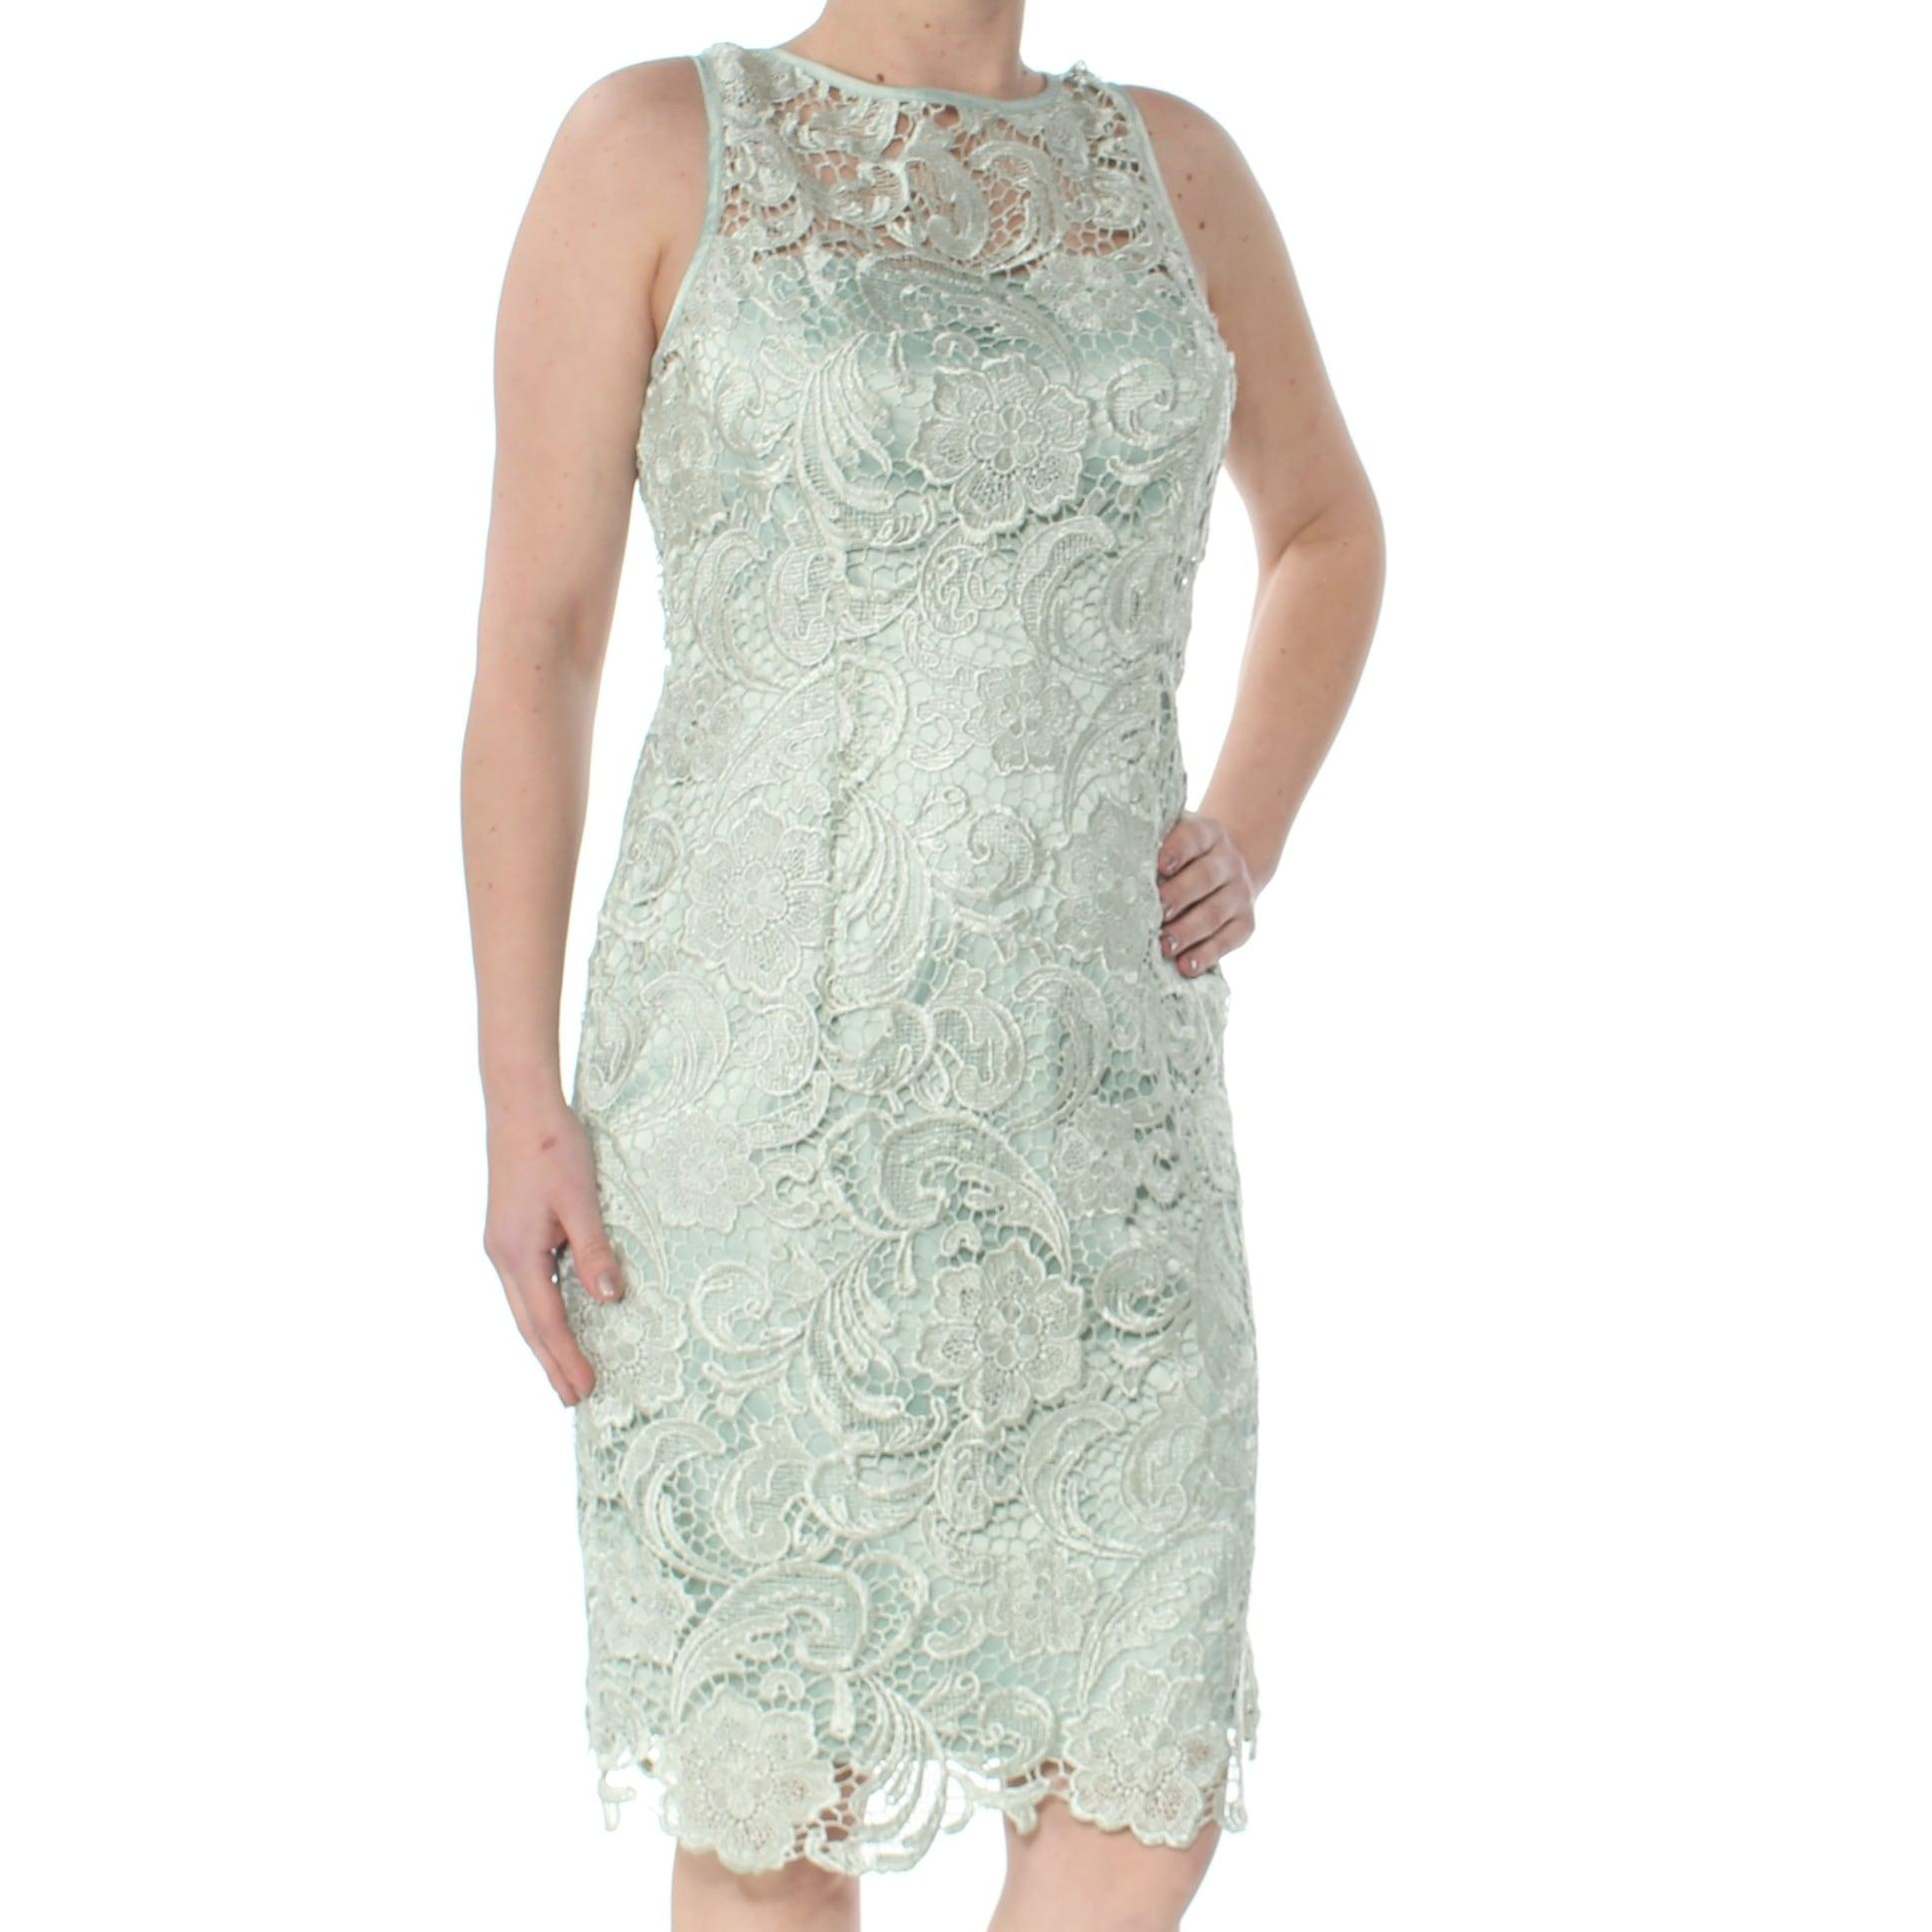 Adrianna Papell Women/'s Lace Halter Sheath Short Dress Choose SZ//Color